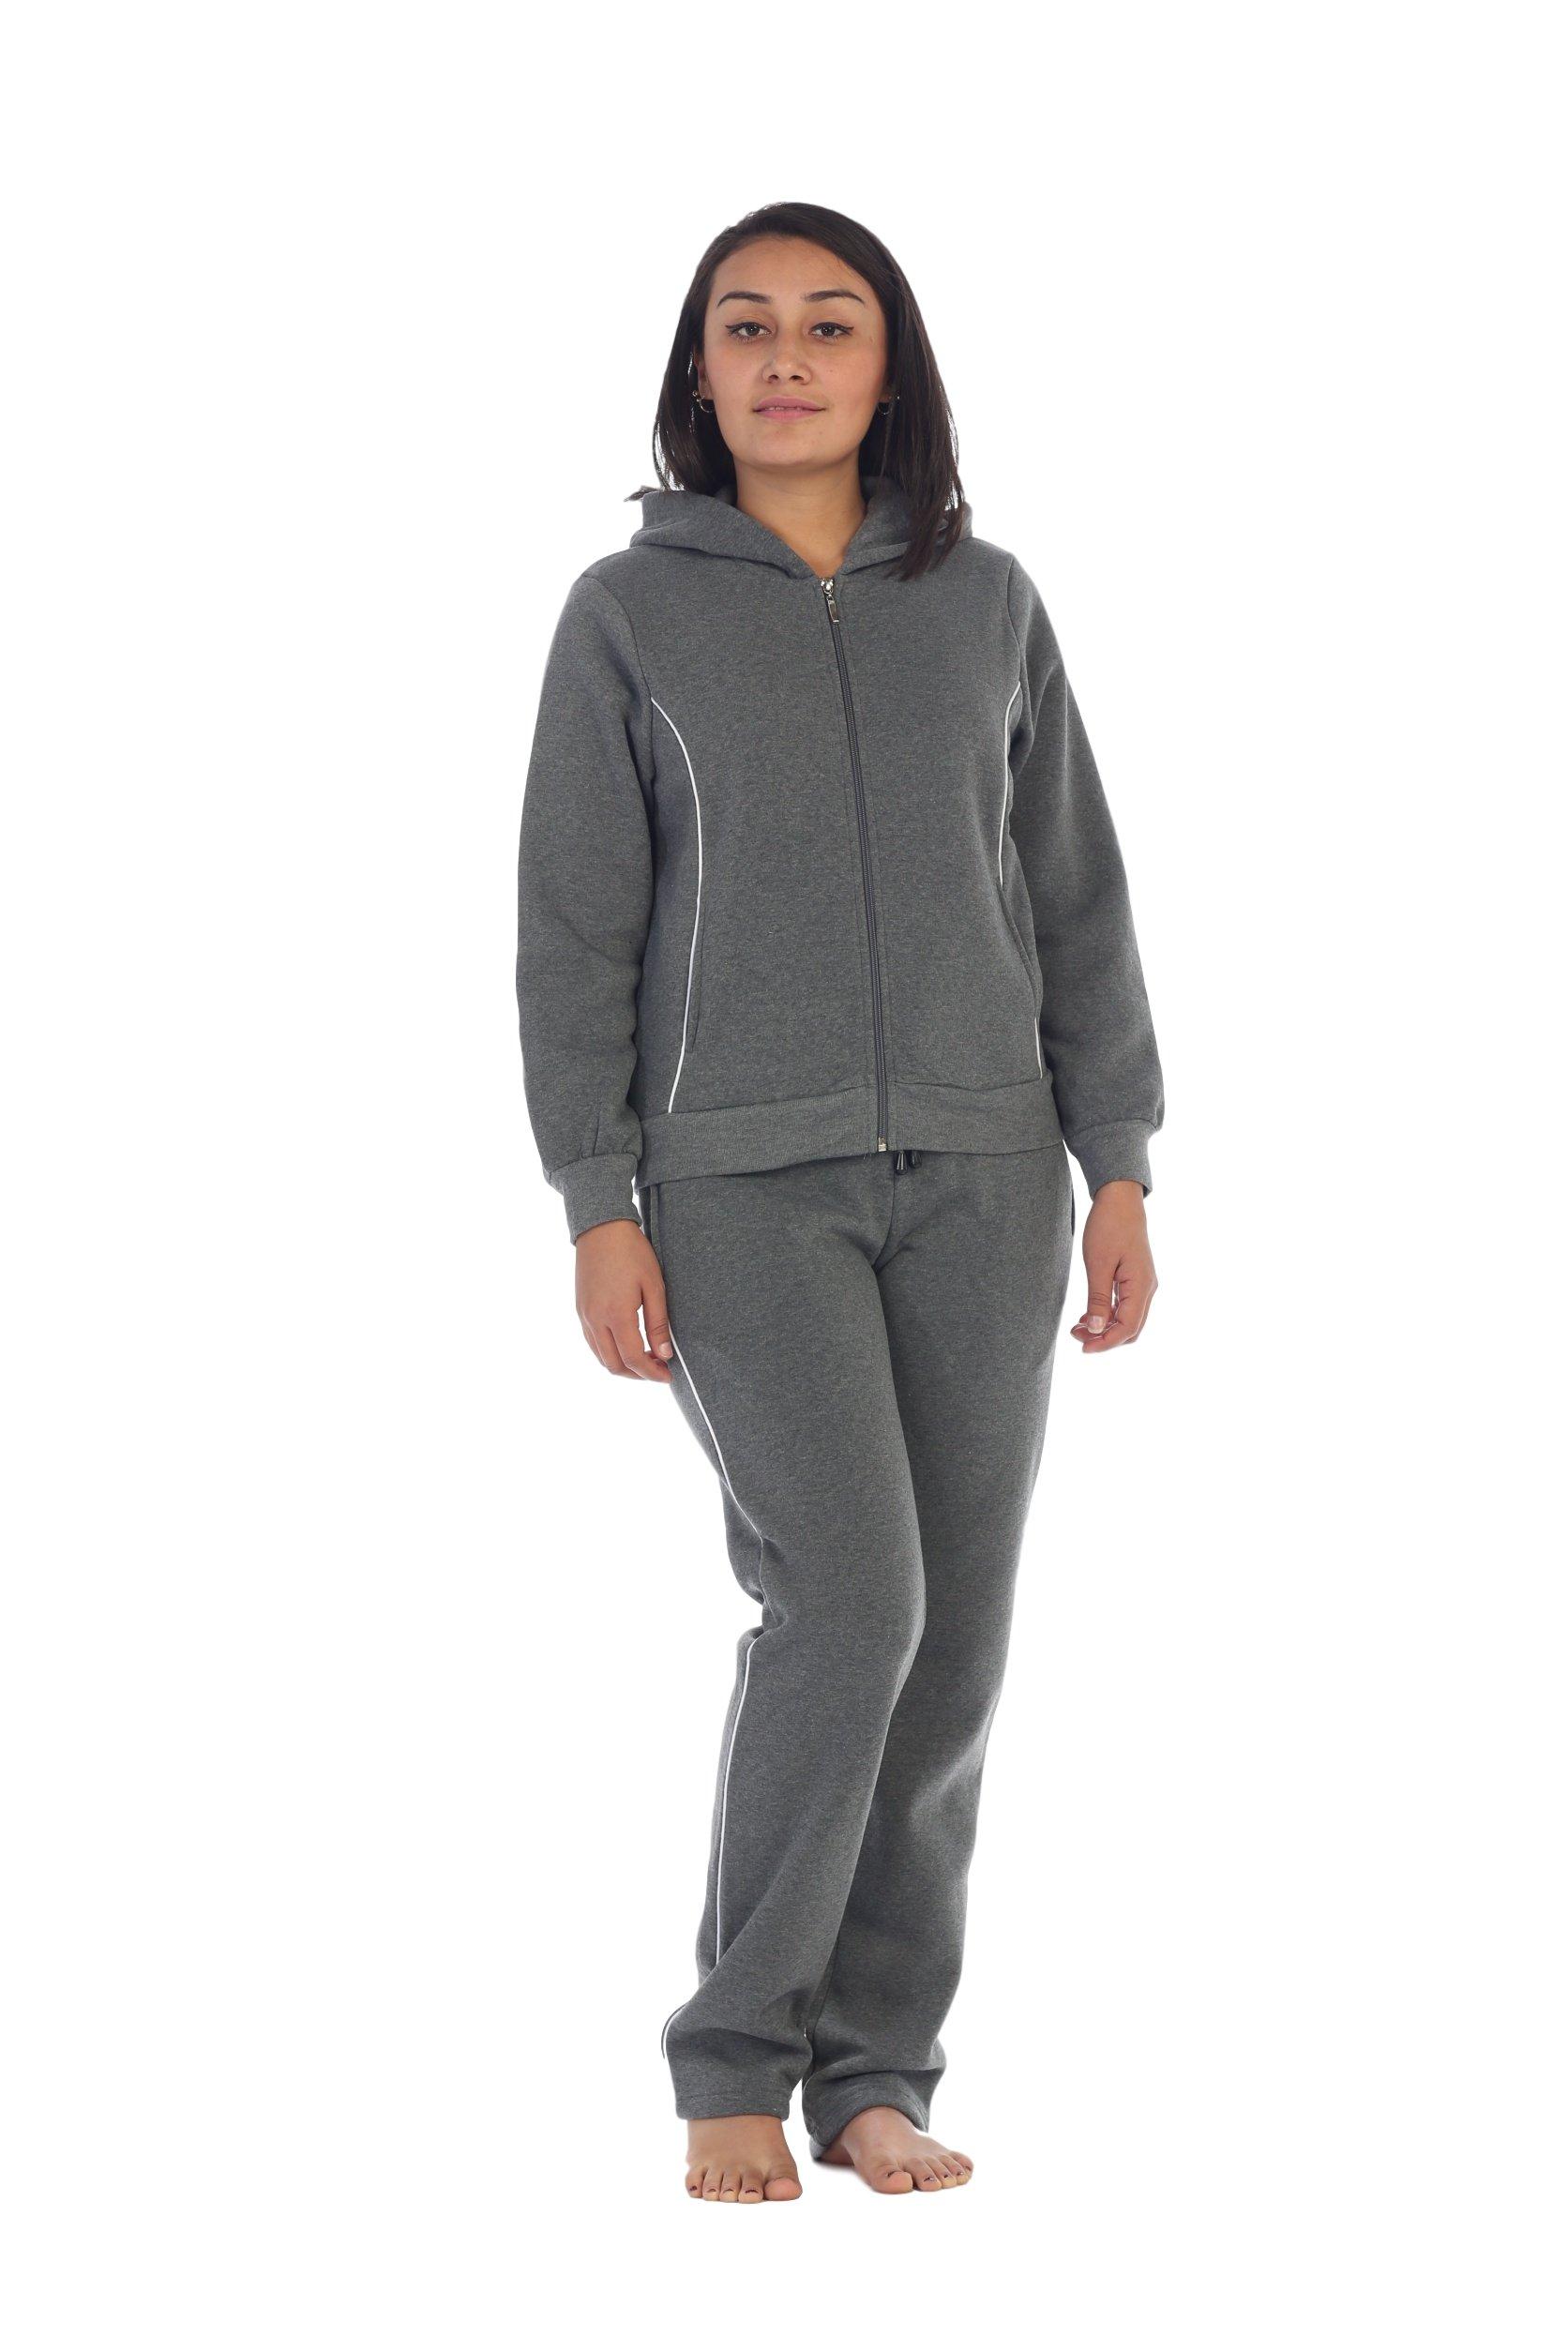 unik Women Fleece Sweatsuit Set, Dark Grey Size Large